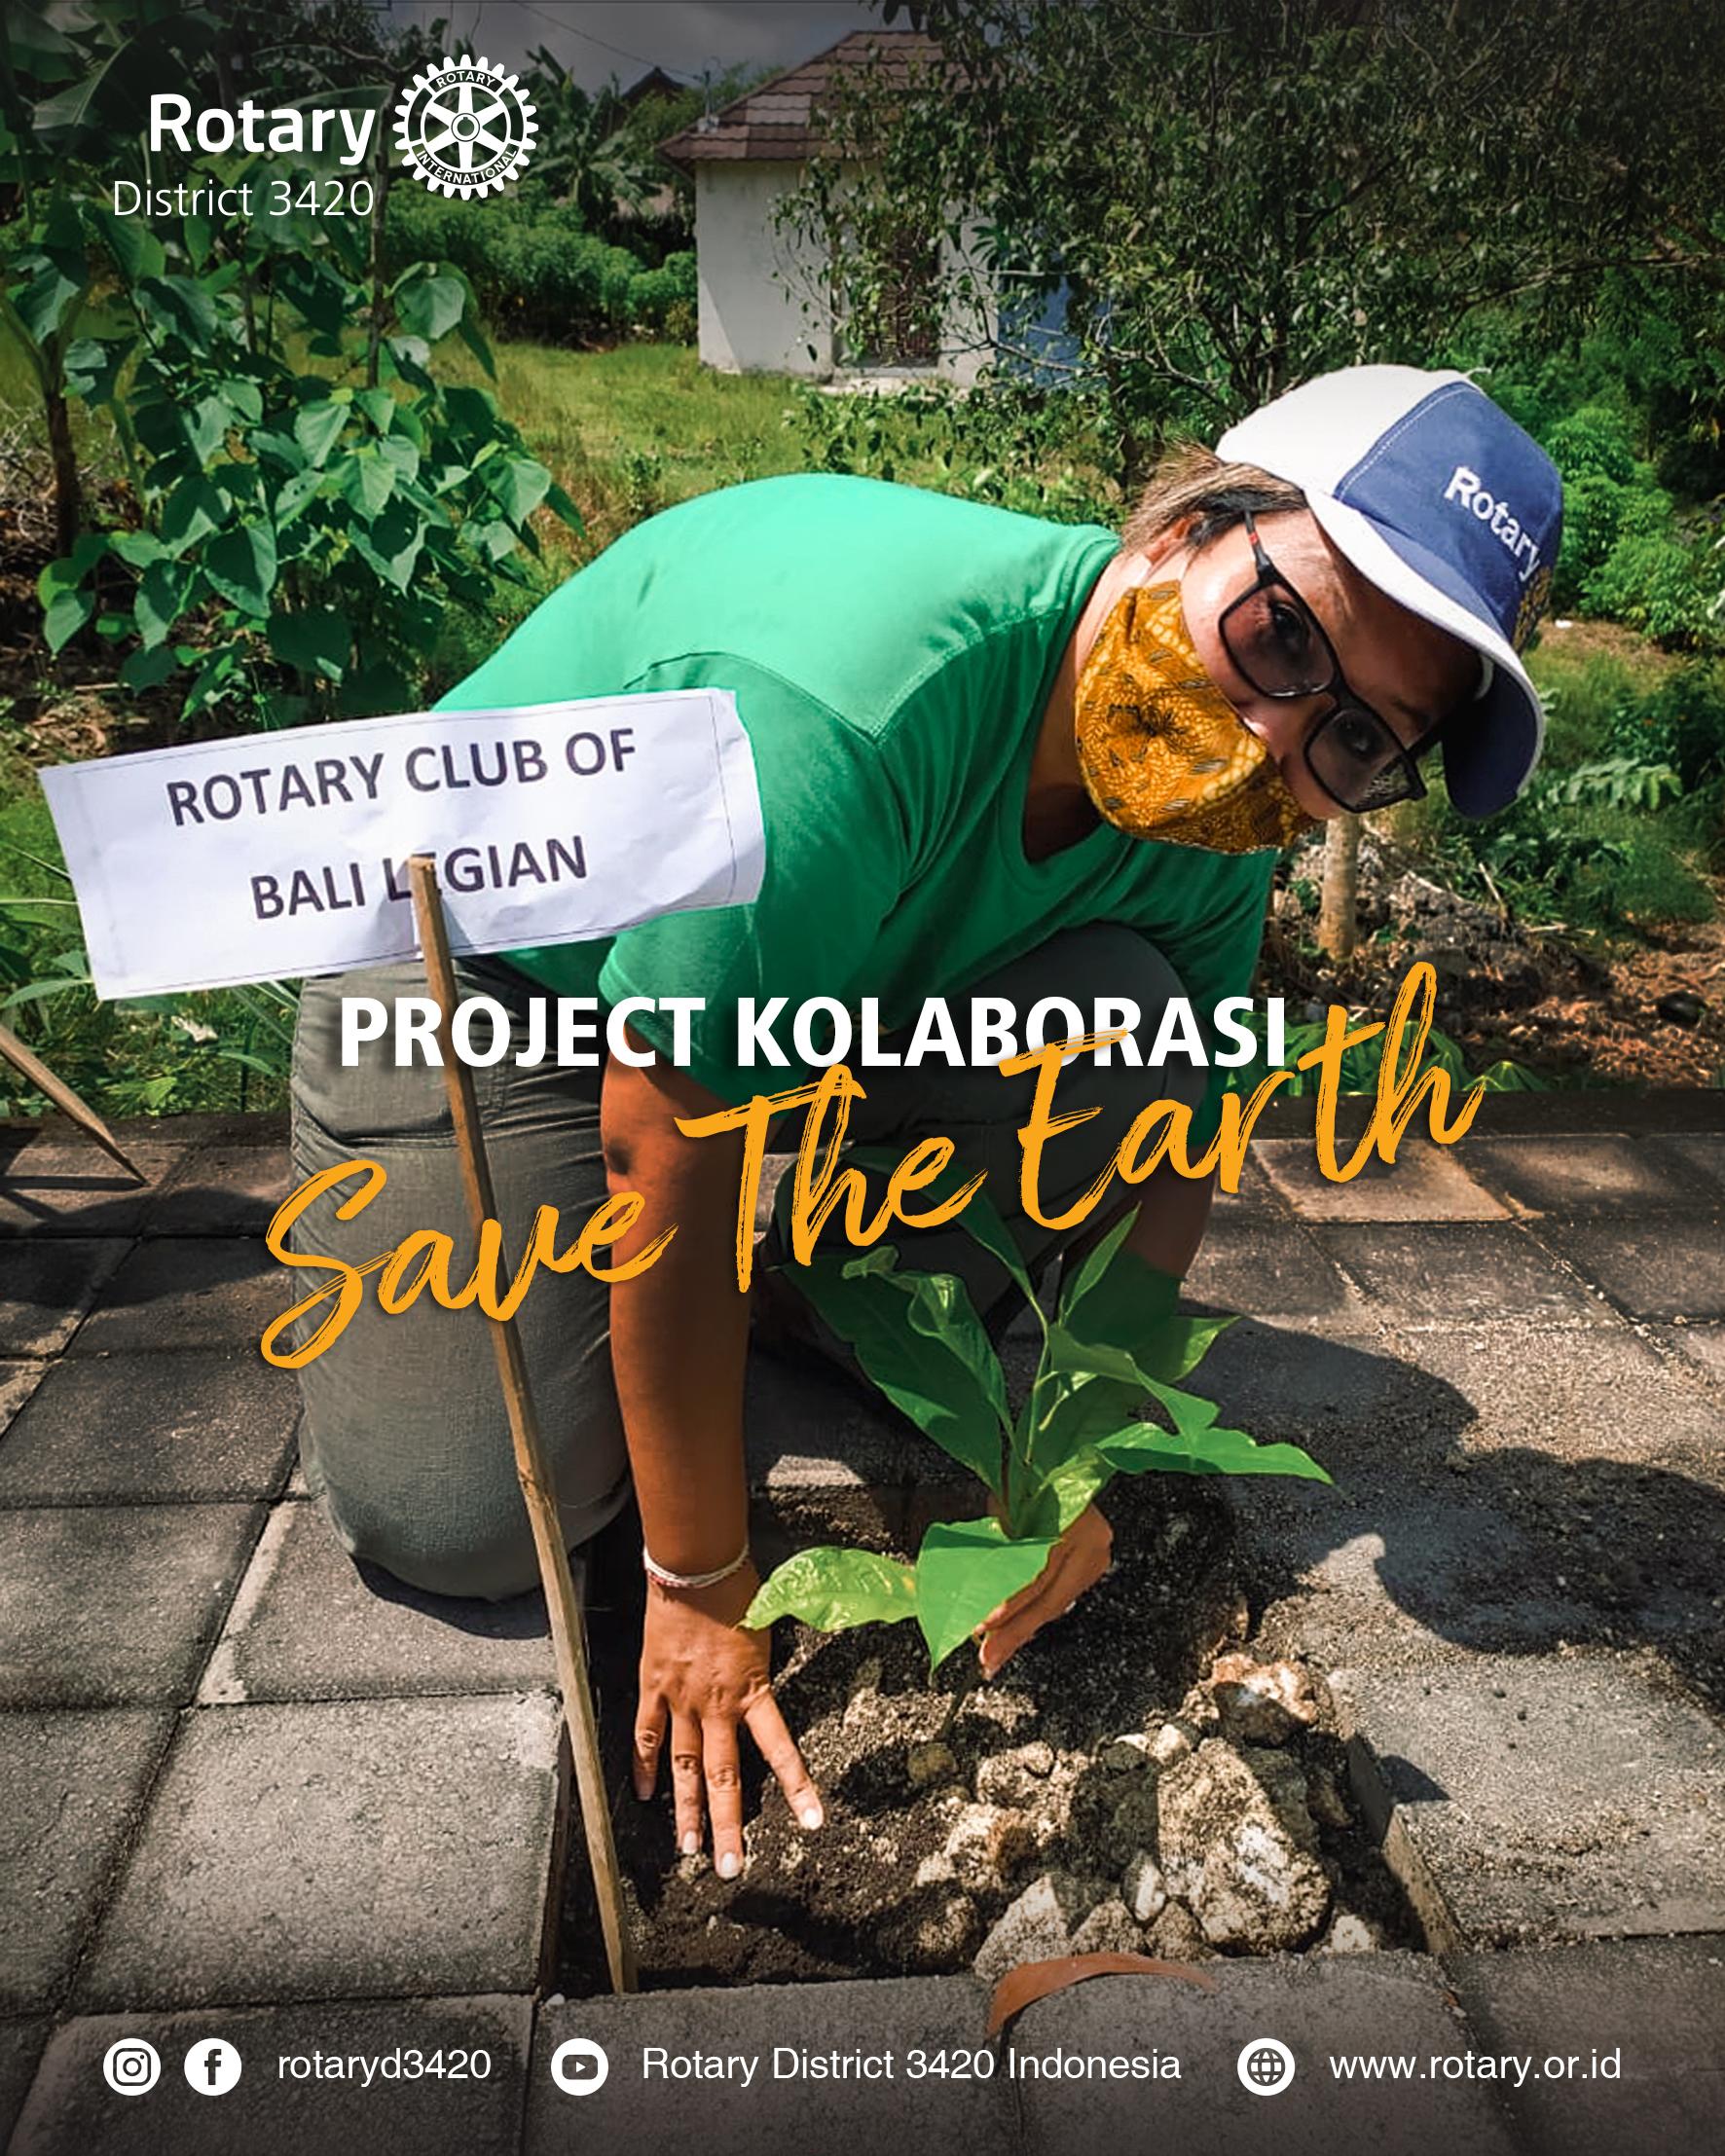 Project Kolaborasi Save The Earth